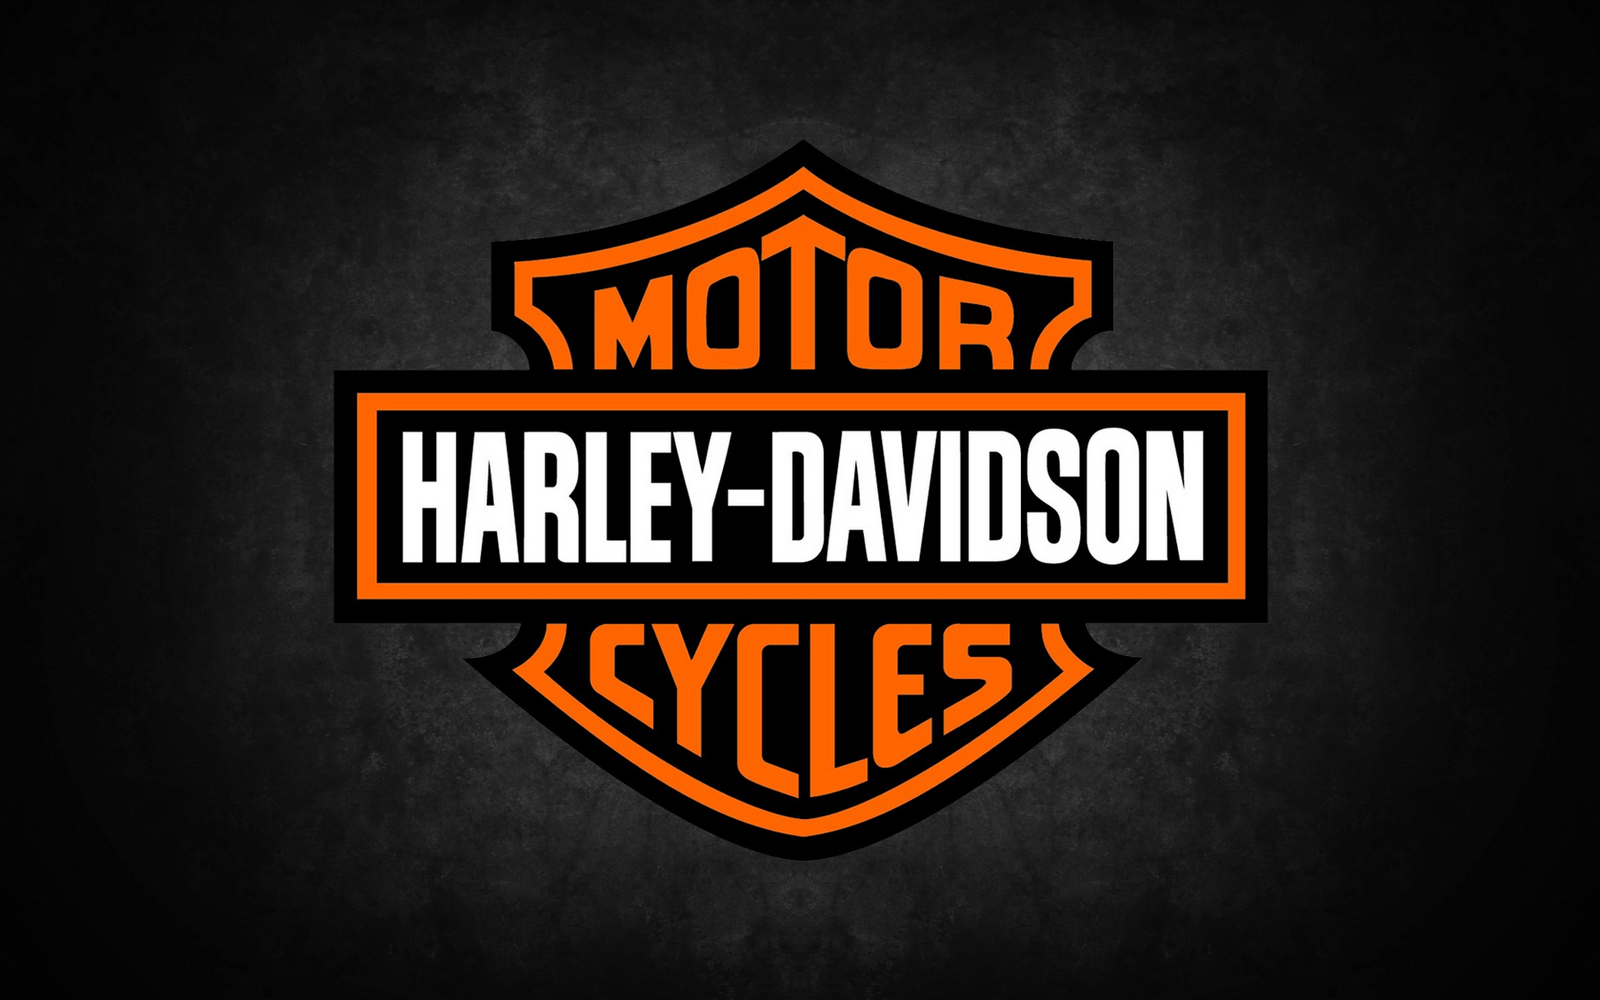 Harley Davidson Logos Wallpapers Wallpapersafari